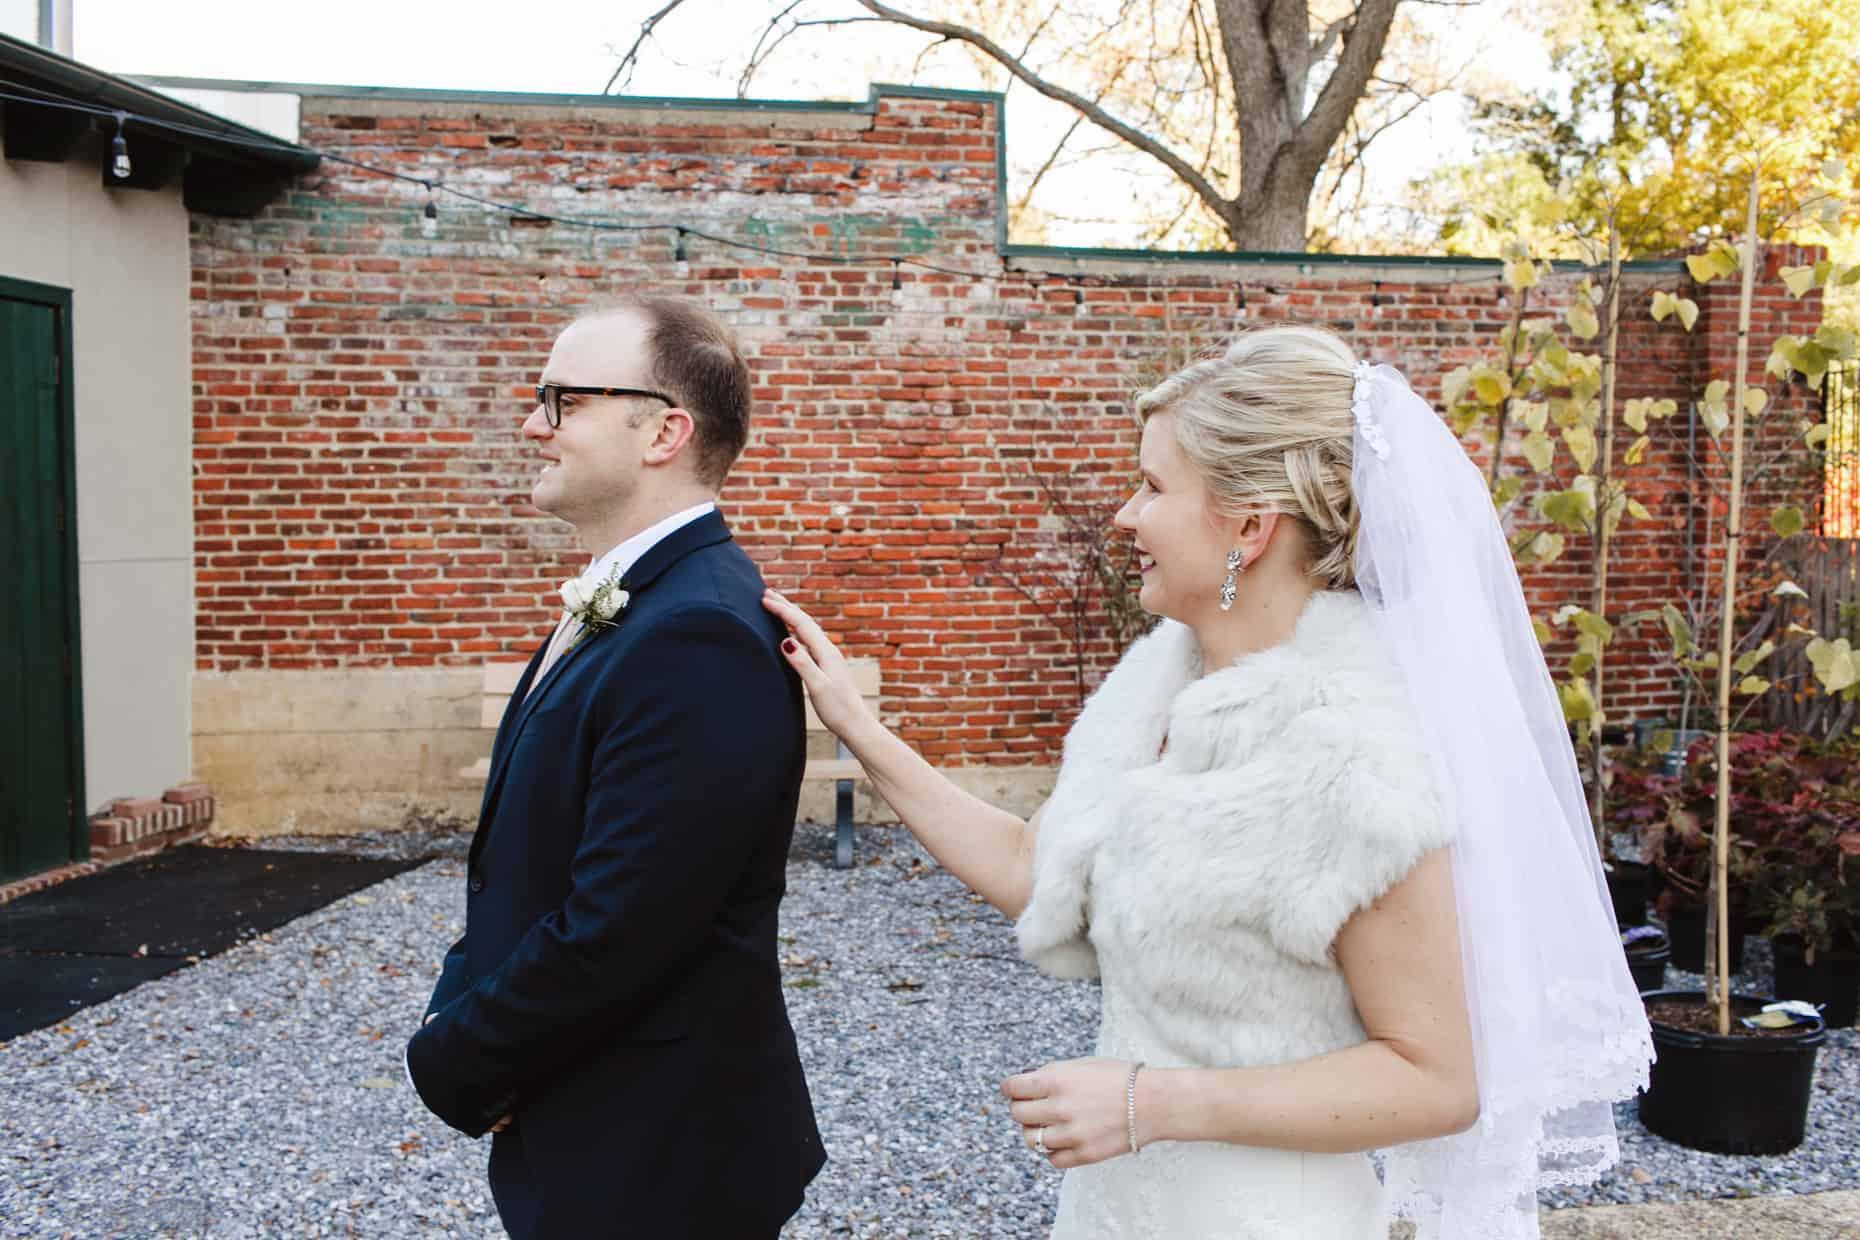 Delaware Center for Horticulture Wedding Photo